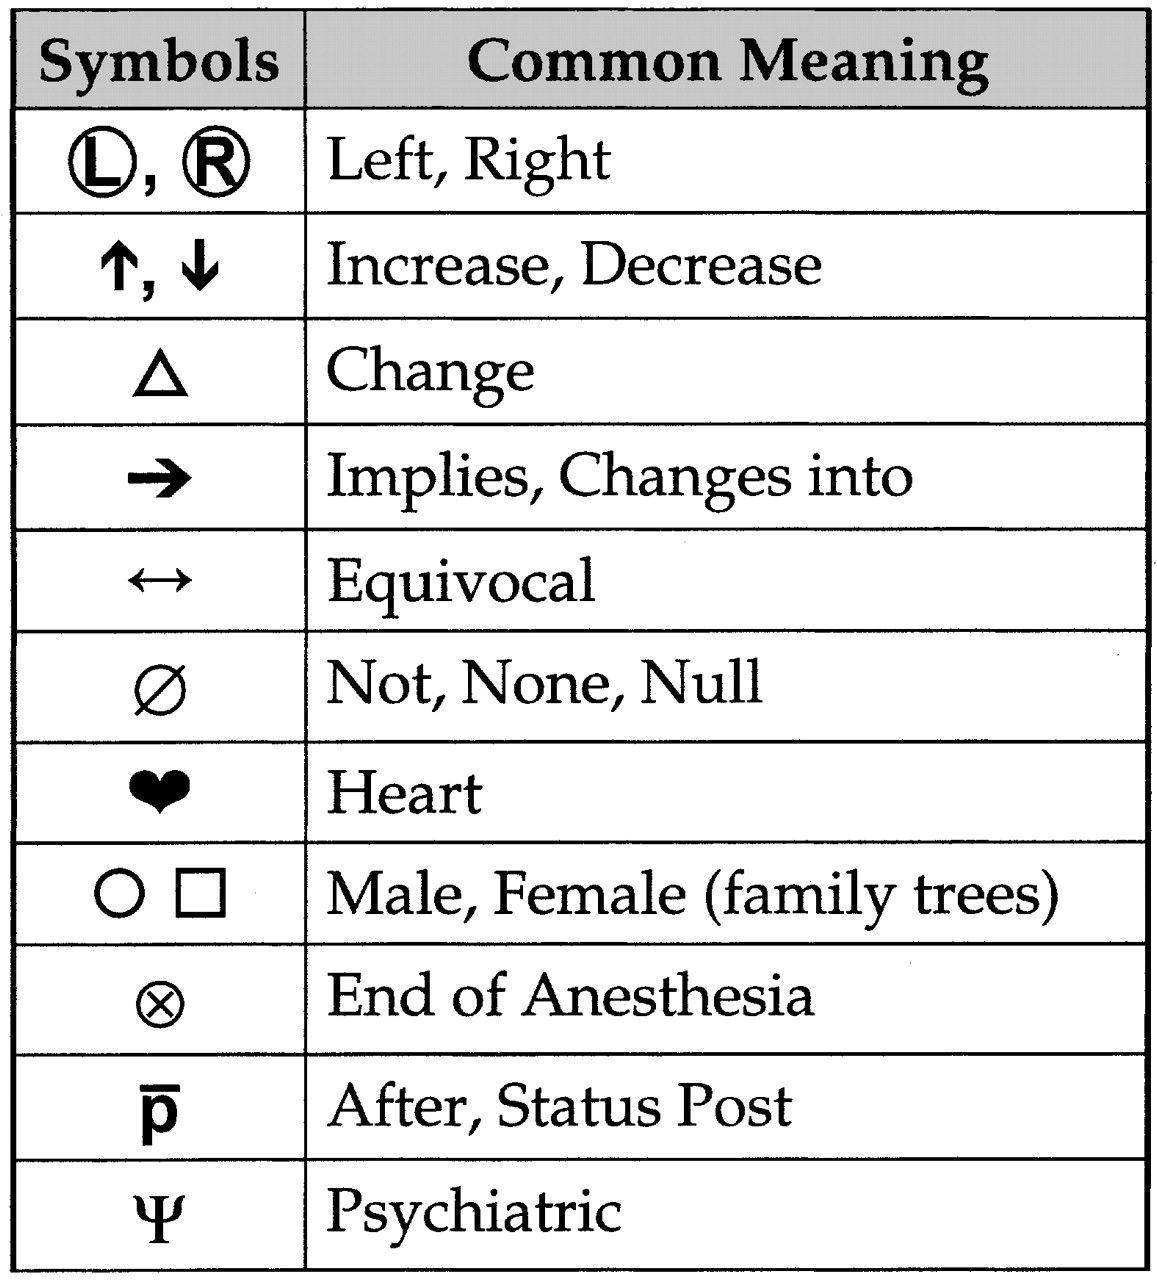 Common Med Symbols